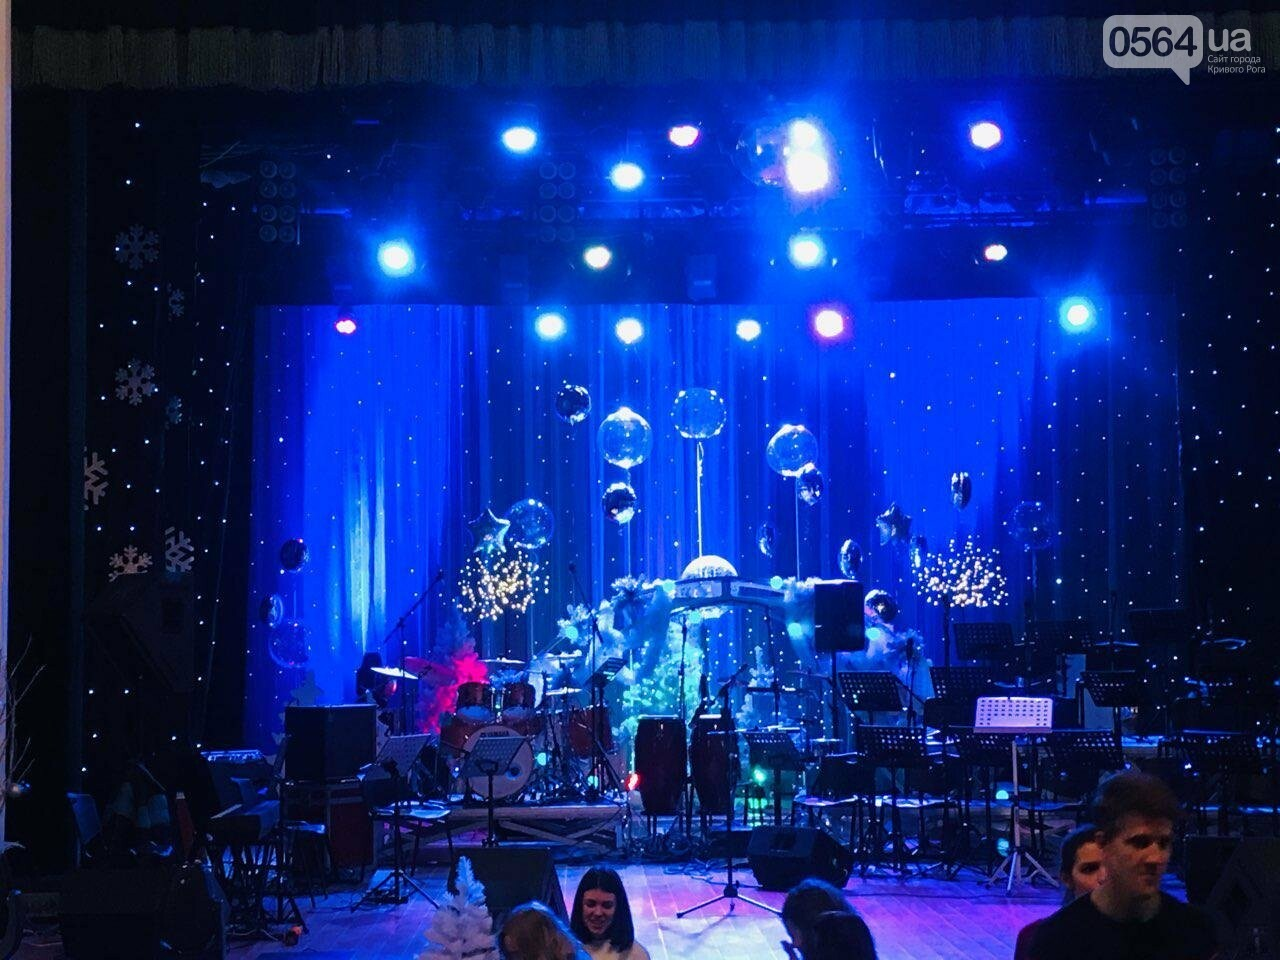 """Let it Snow"": на первое Рождество в Кривом Роге играют джаз, - ФОТО, ВИДЕО, фото-6"